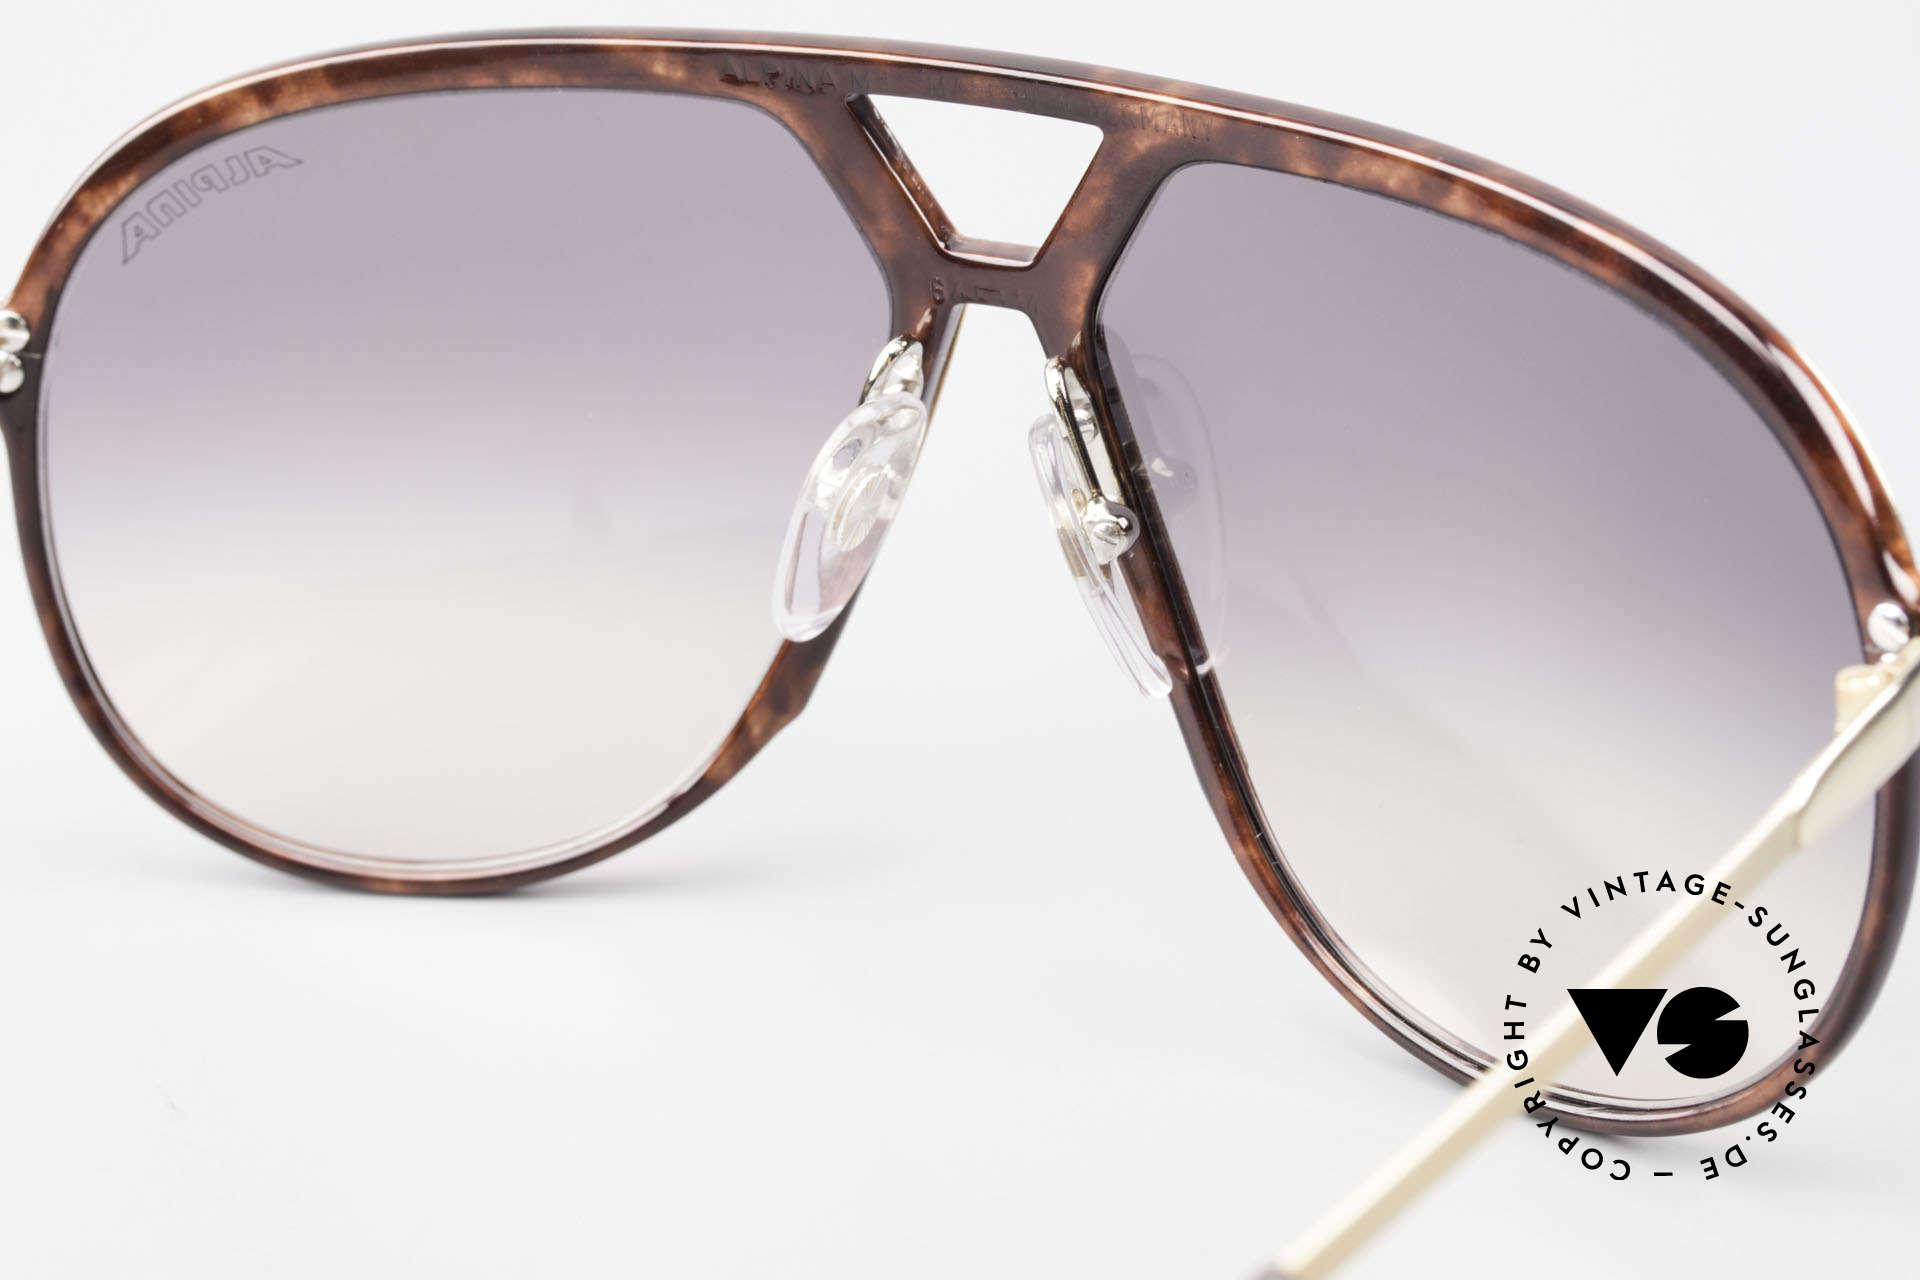 Alpina M1 Ultra Rare Aviator Sunglasses, Stevie Wonder made this model popular in the 80s, Made for Men